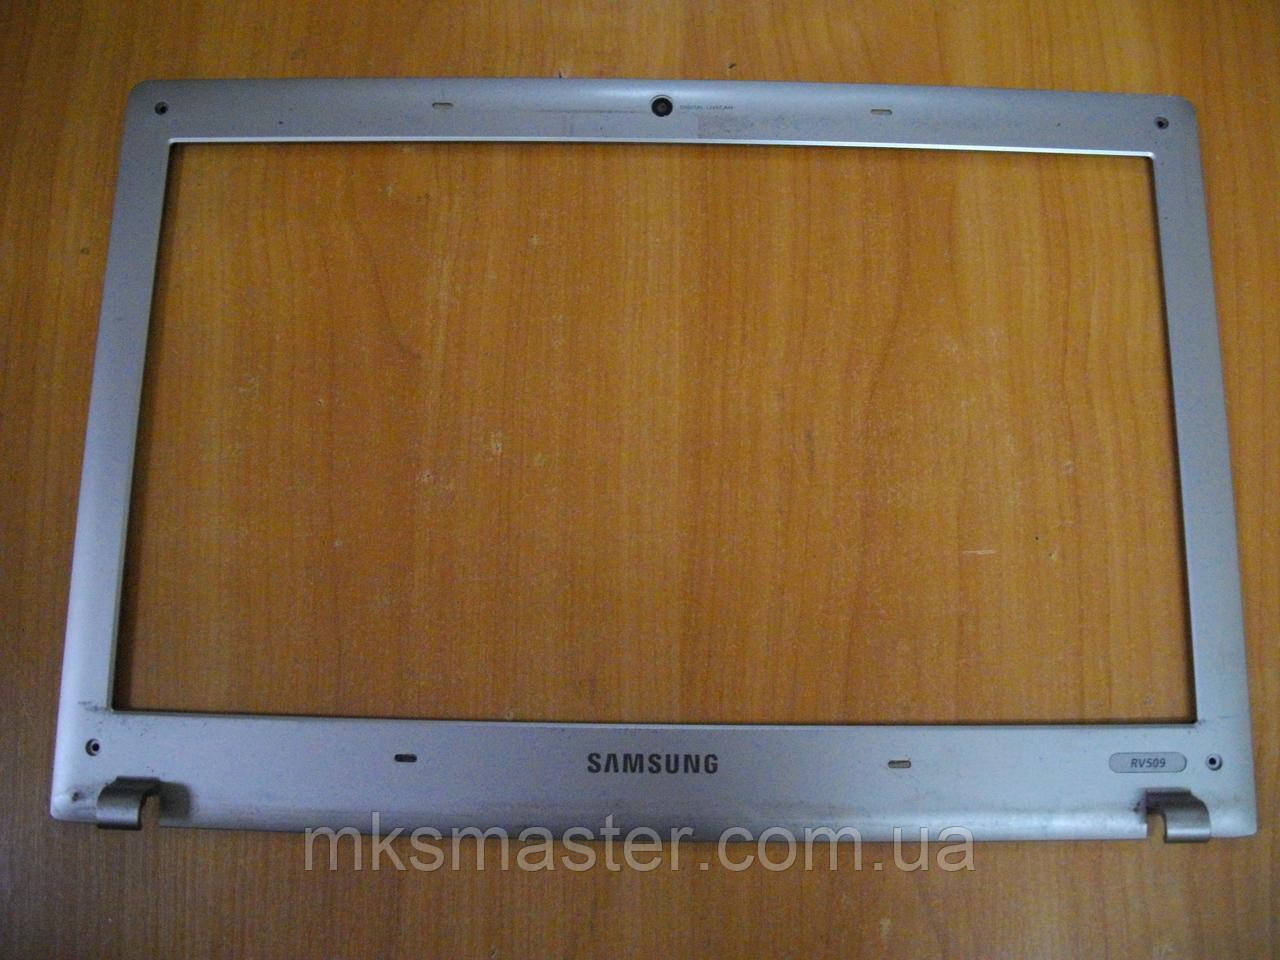 Оригинальный Корпус Рамка матрицы Samsung NP-RV509, RV509 бу